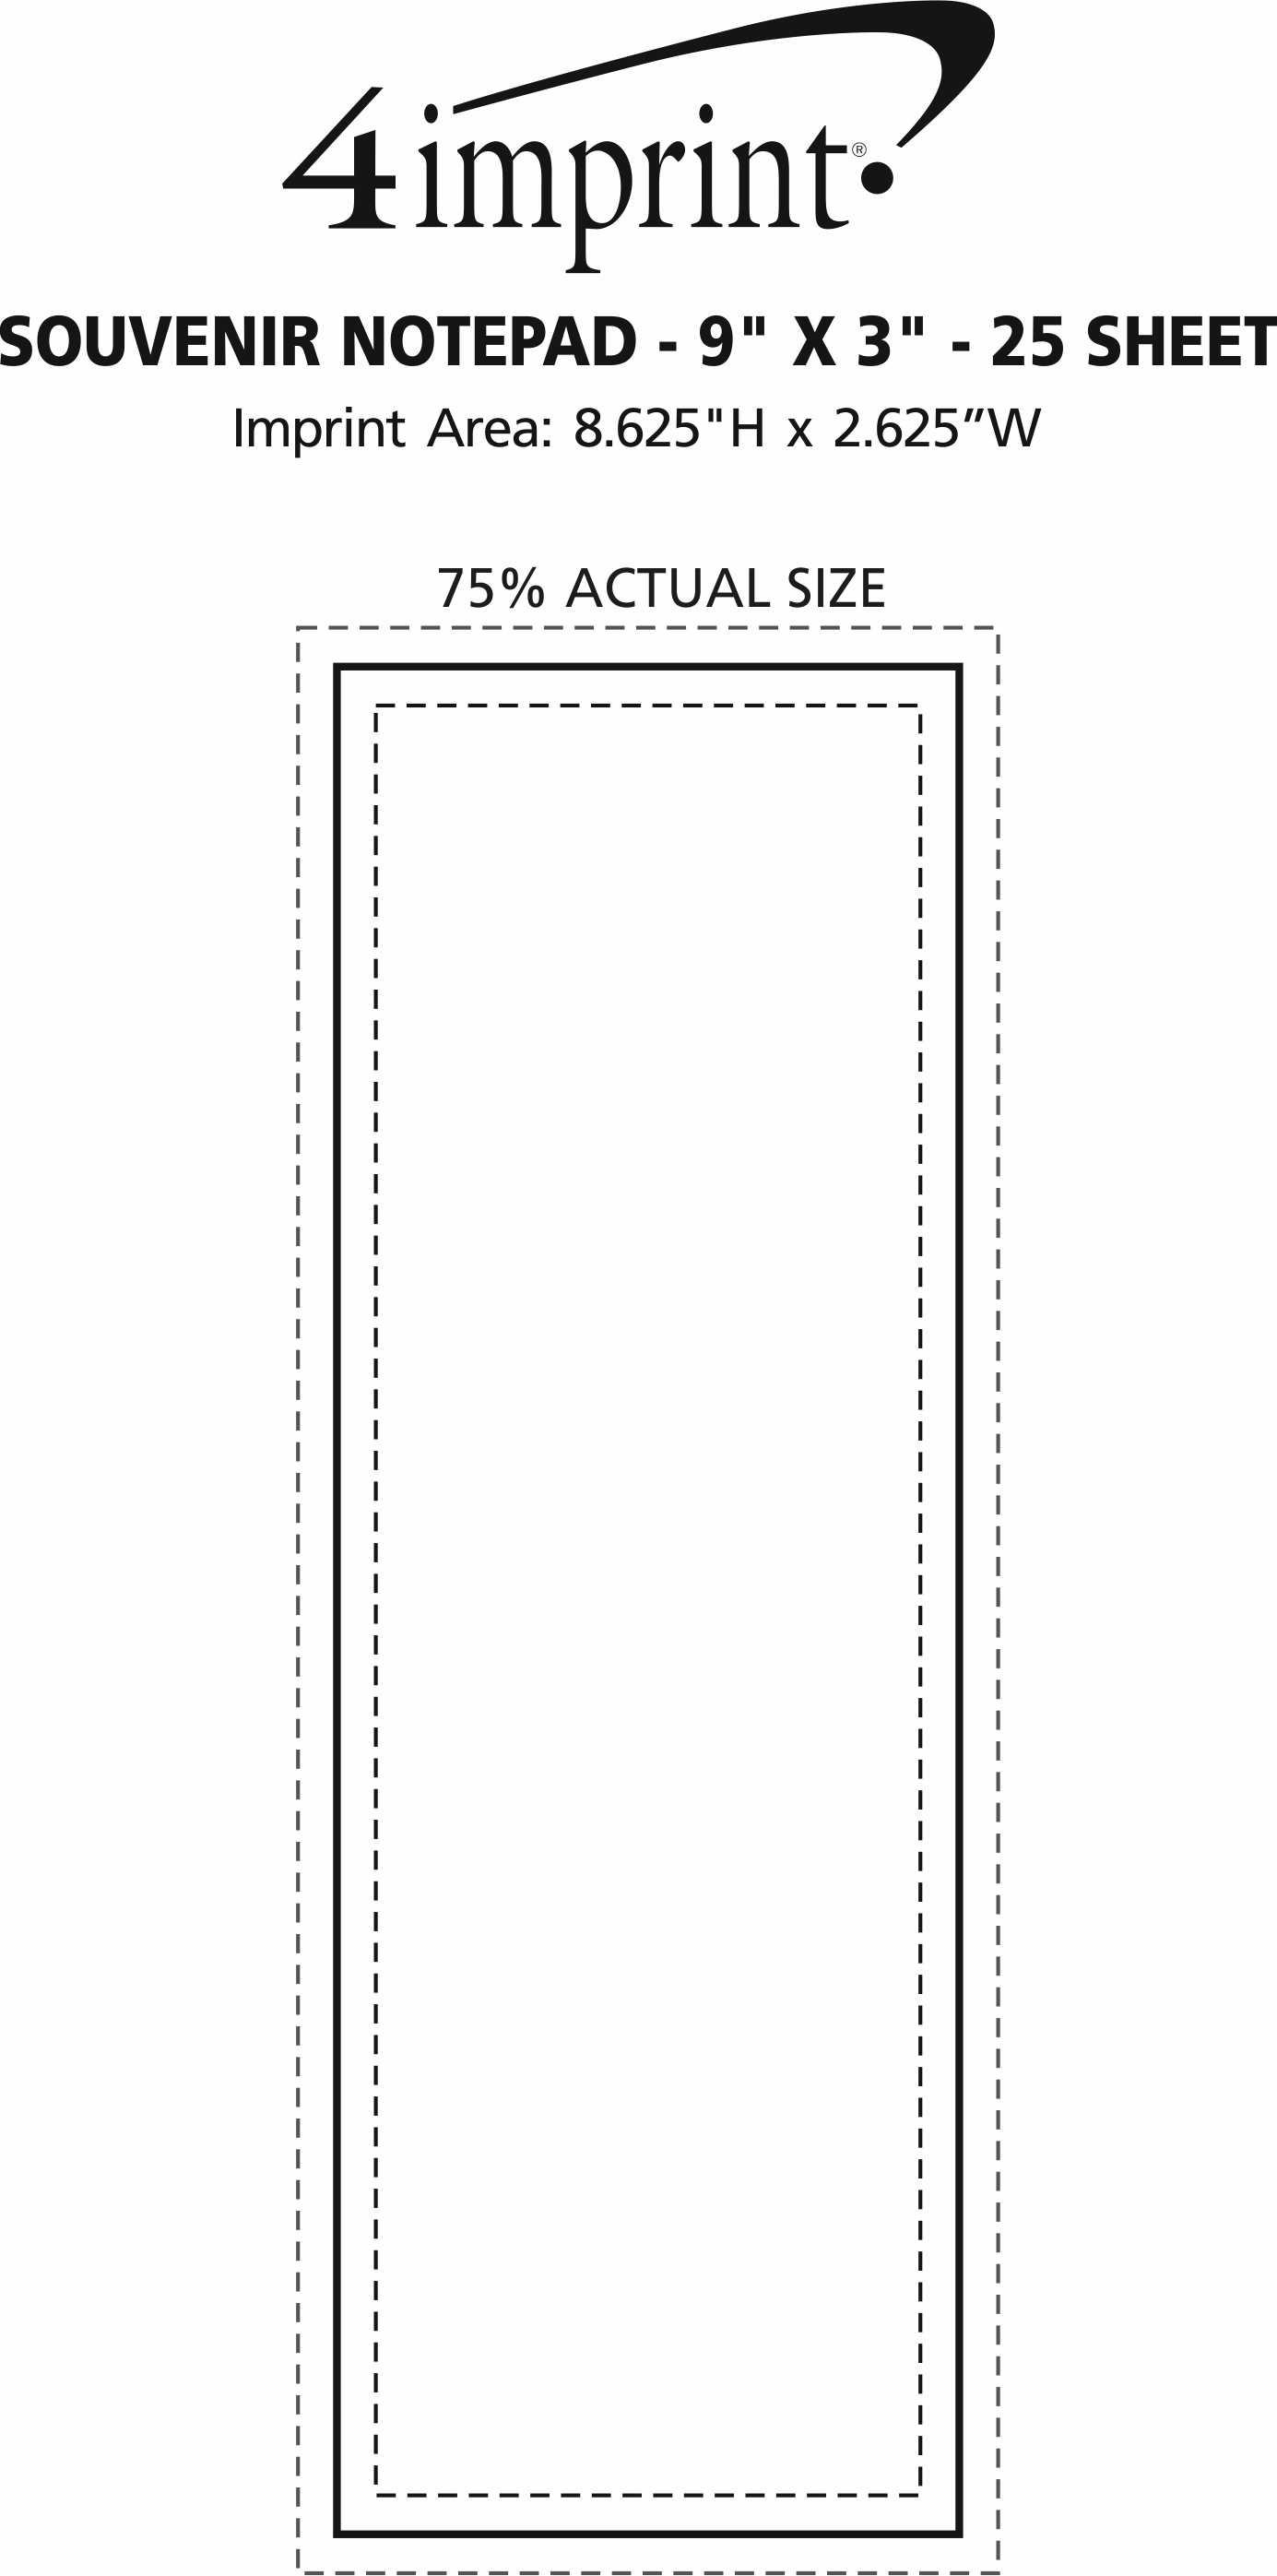 "Imprint Area of Bic Non-Adhesive Notepad - 9"" x 3"" - 25 Sheet"